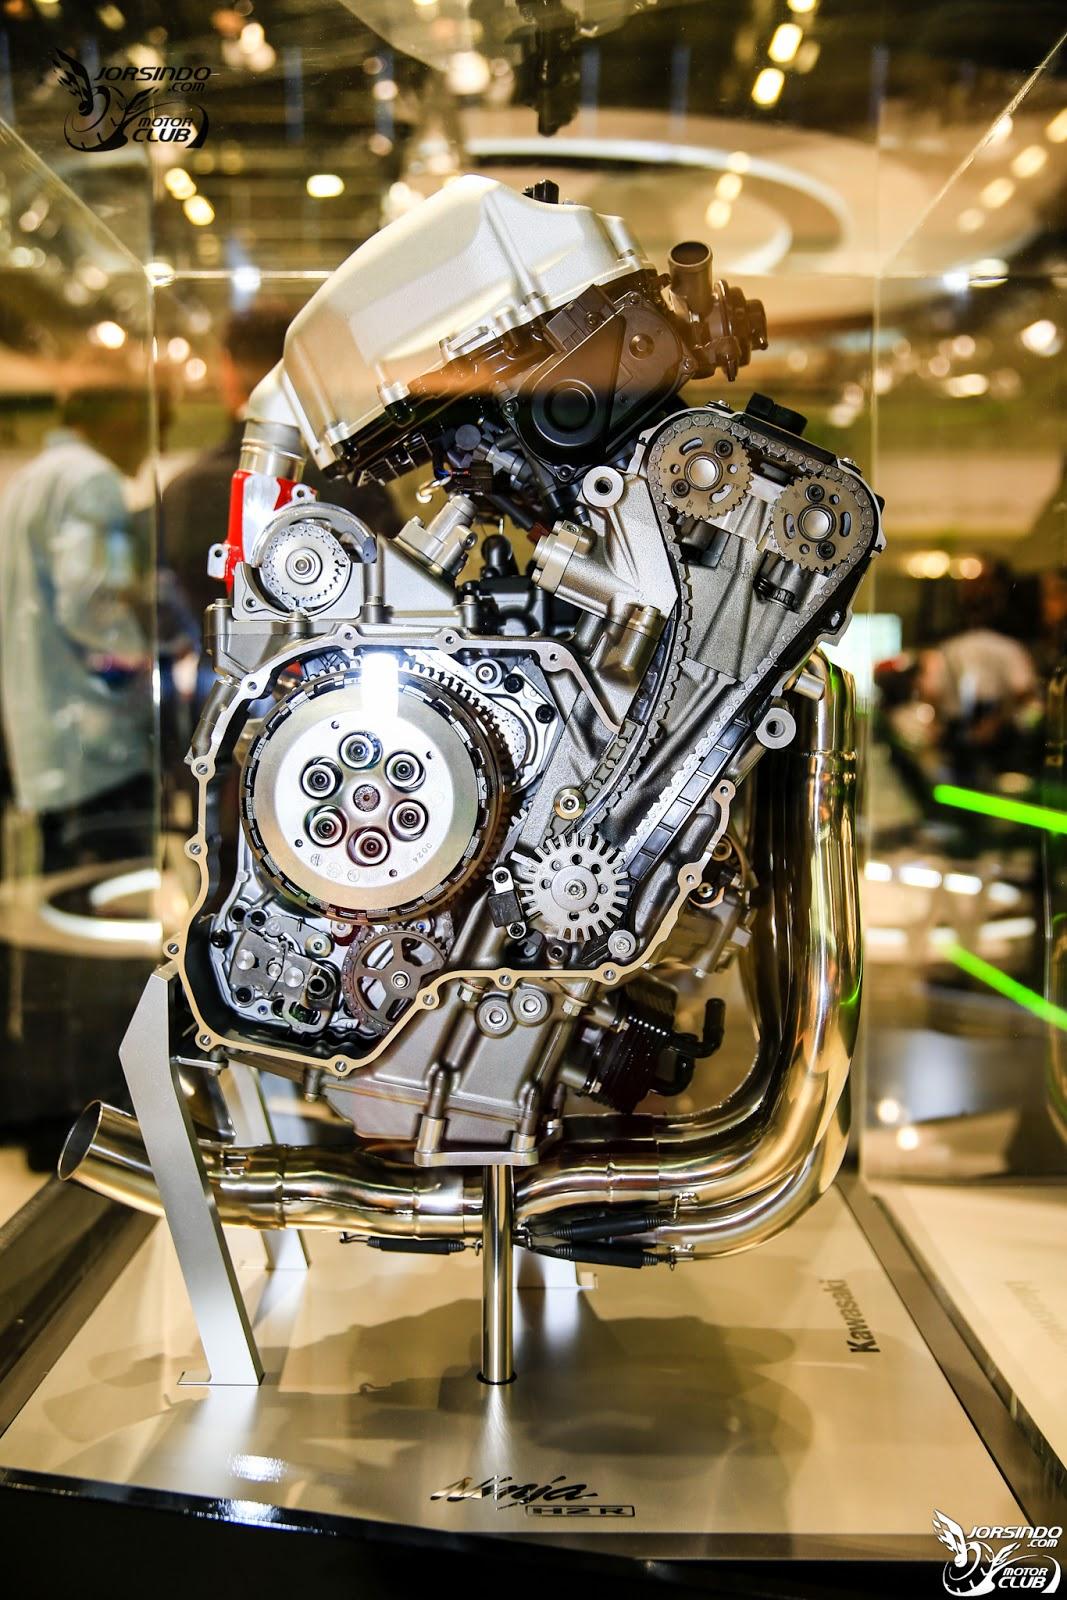 Kawasaki Ninja H2 engine